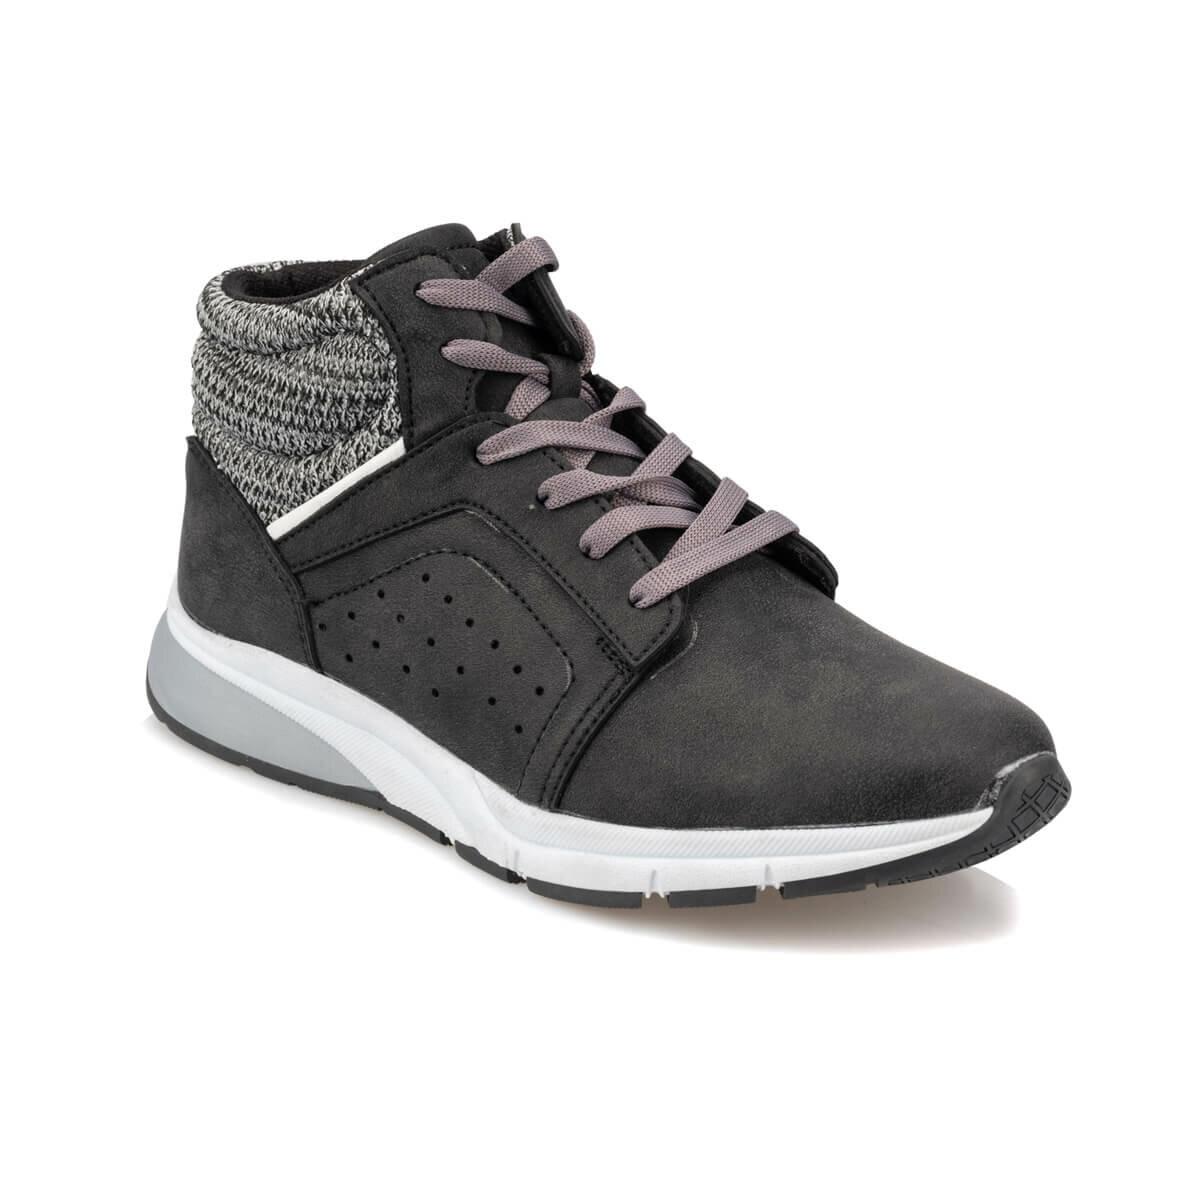 FLO 92.511981.G Black Male Child Sports Shoes Polaris